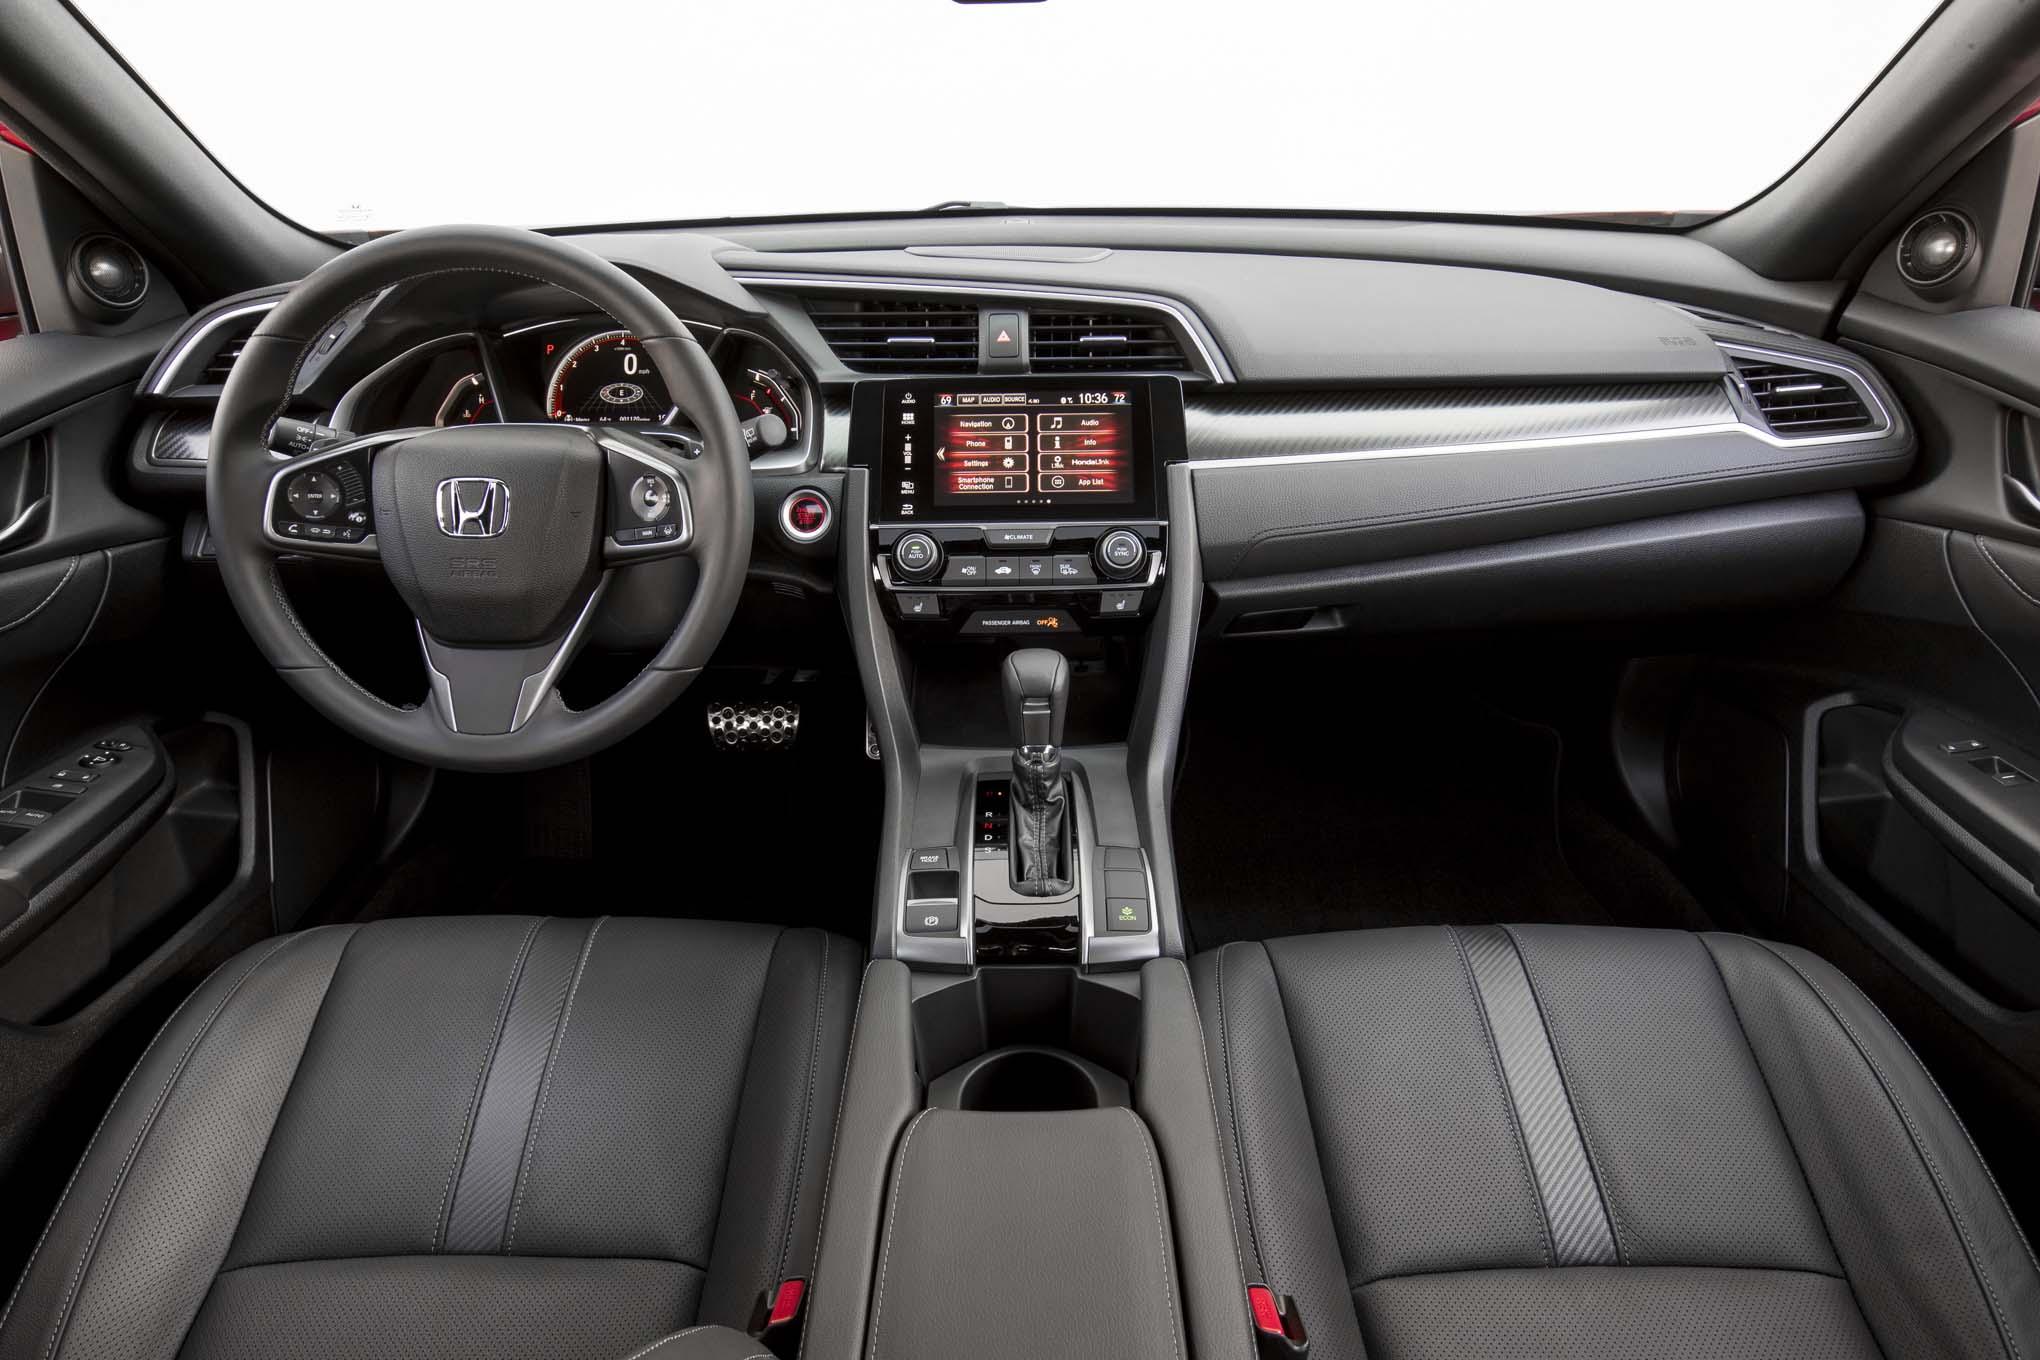 2017 Honda Civic Hatchback Ex L W Navi First Drive Review Automobile Magazine